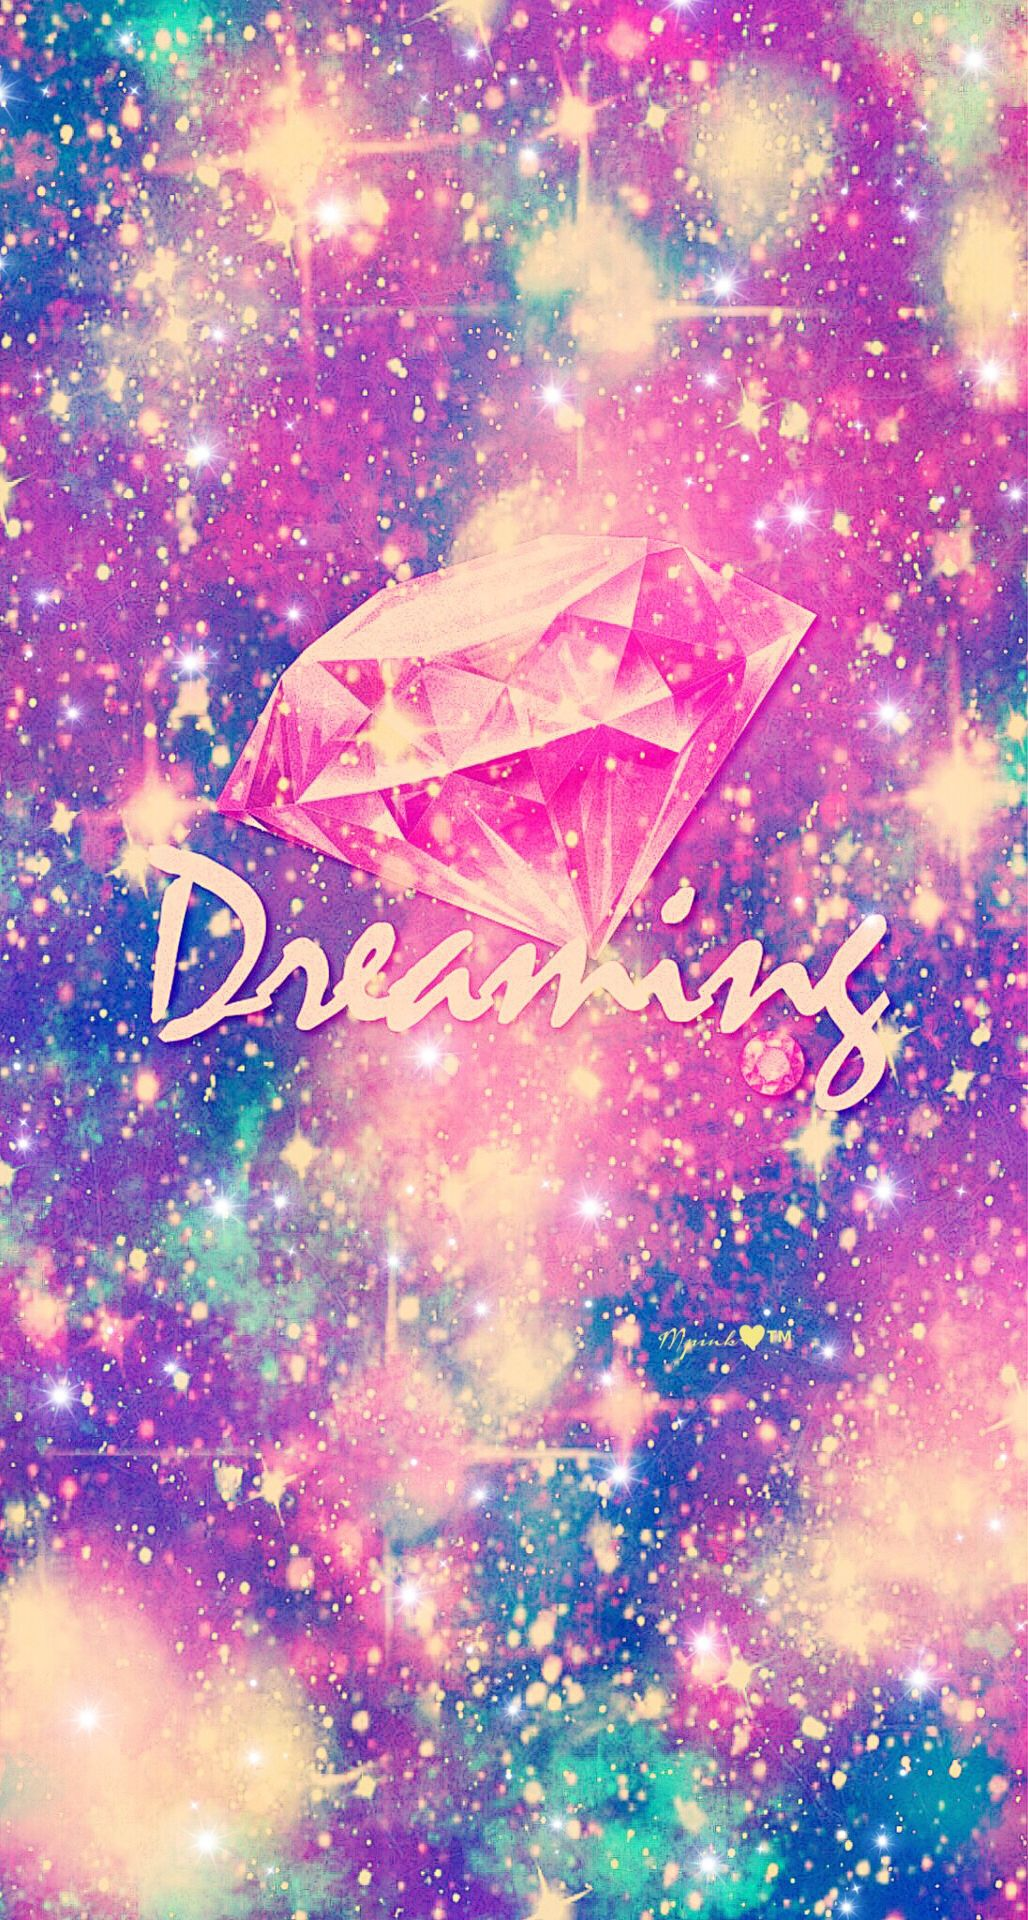 Glitter Girly Galaxy Wallpaper : glitter, girly, galaxy, wallpaper, Dreaming, Galaxy, Wallpaper, #androidwallpaper, #iphonewallpaper, #wallpaper, #sparkle, #glitter, #lo…, Wallpaper,, Glitter